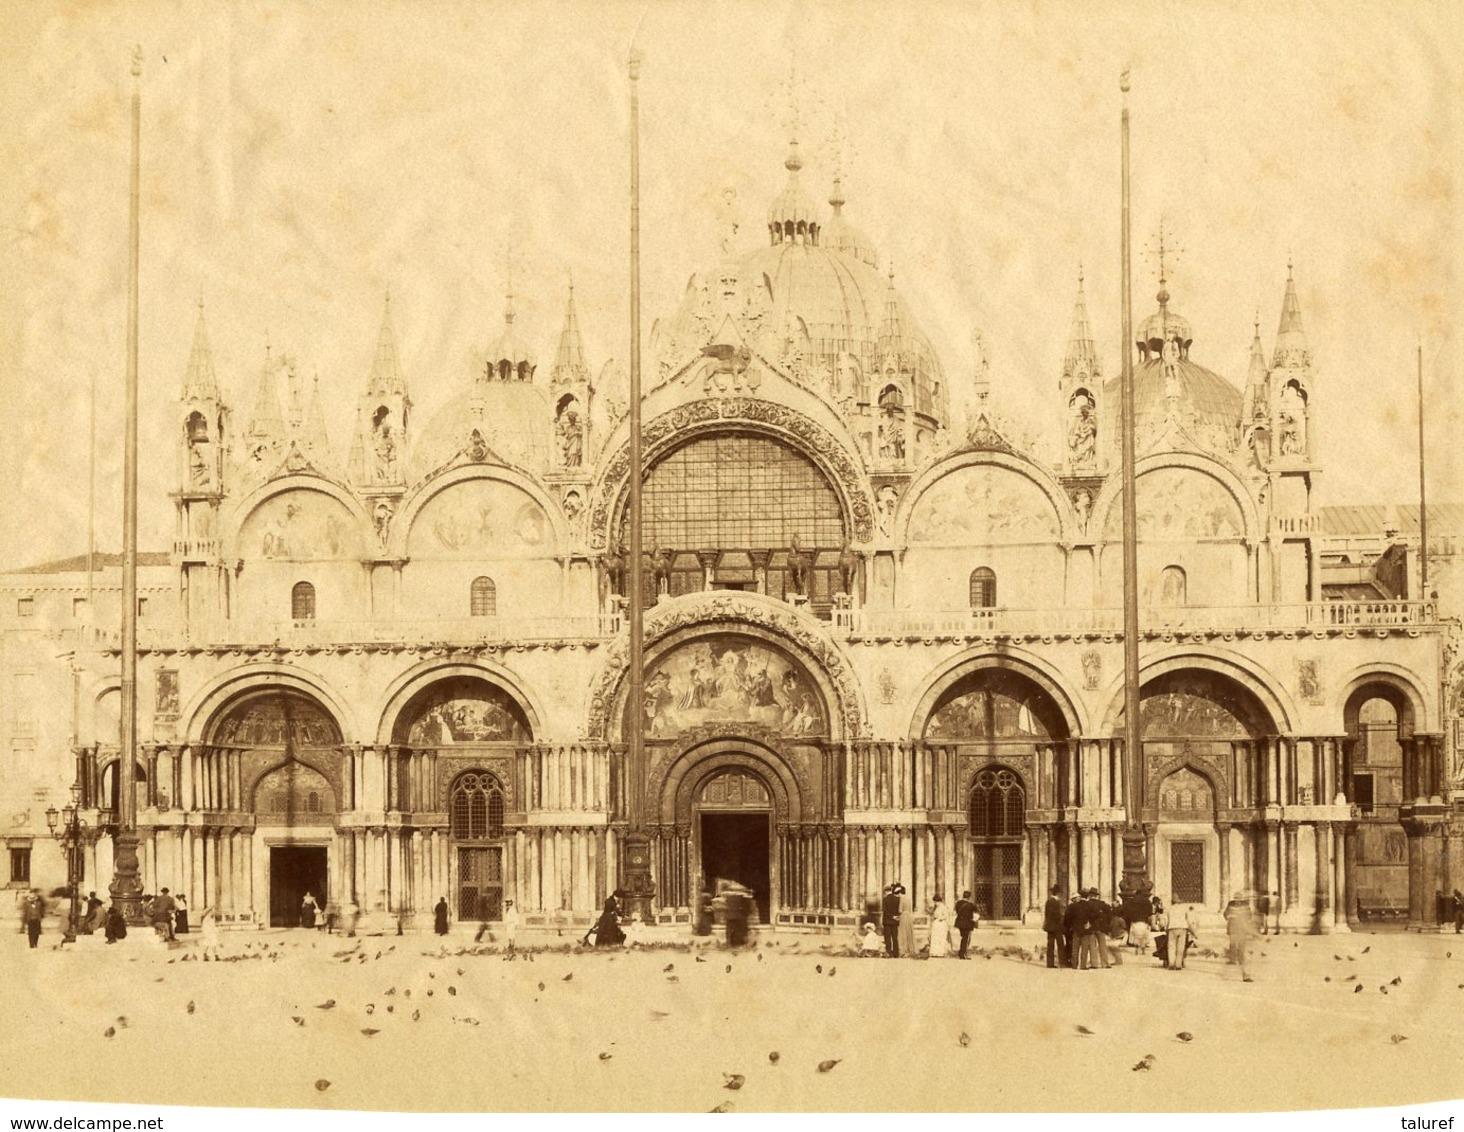 ITALIE - VENISE - Place St MARC - Tirage ALBUMINE - Circa 1875 - Anciennes (Av. 1900)